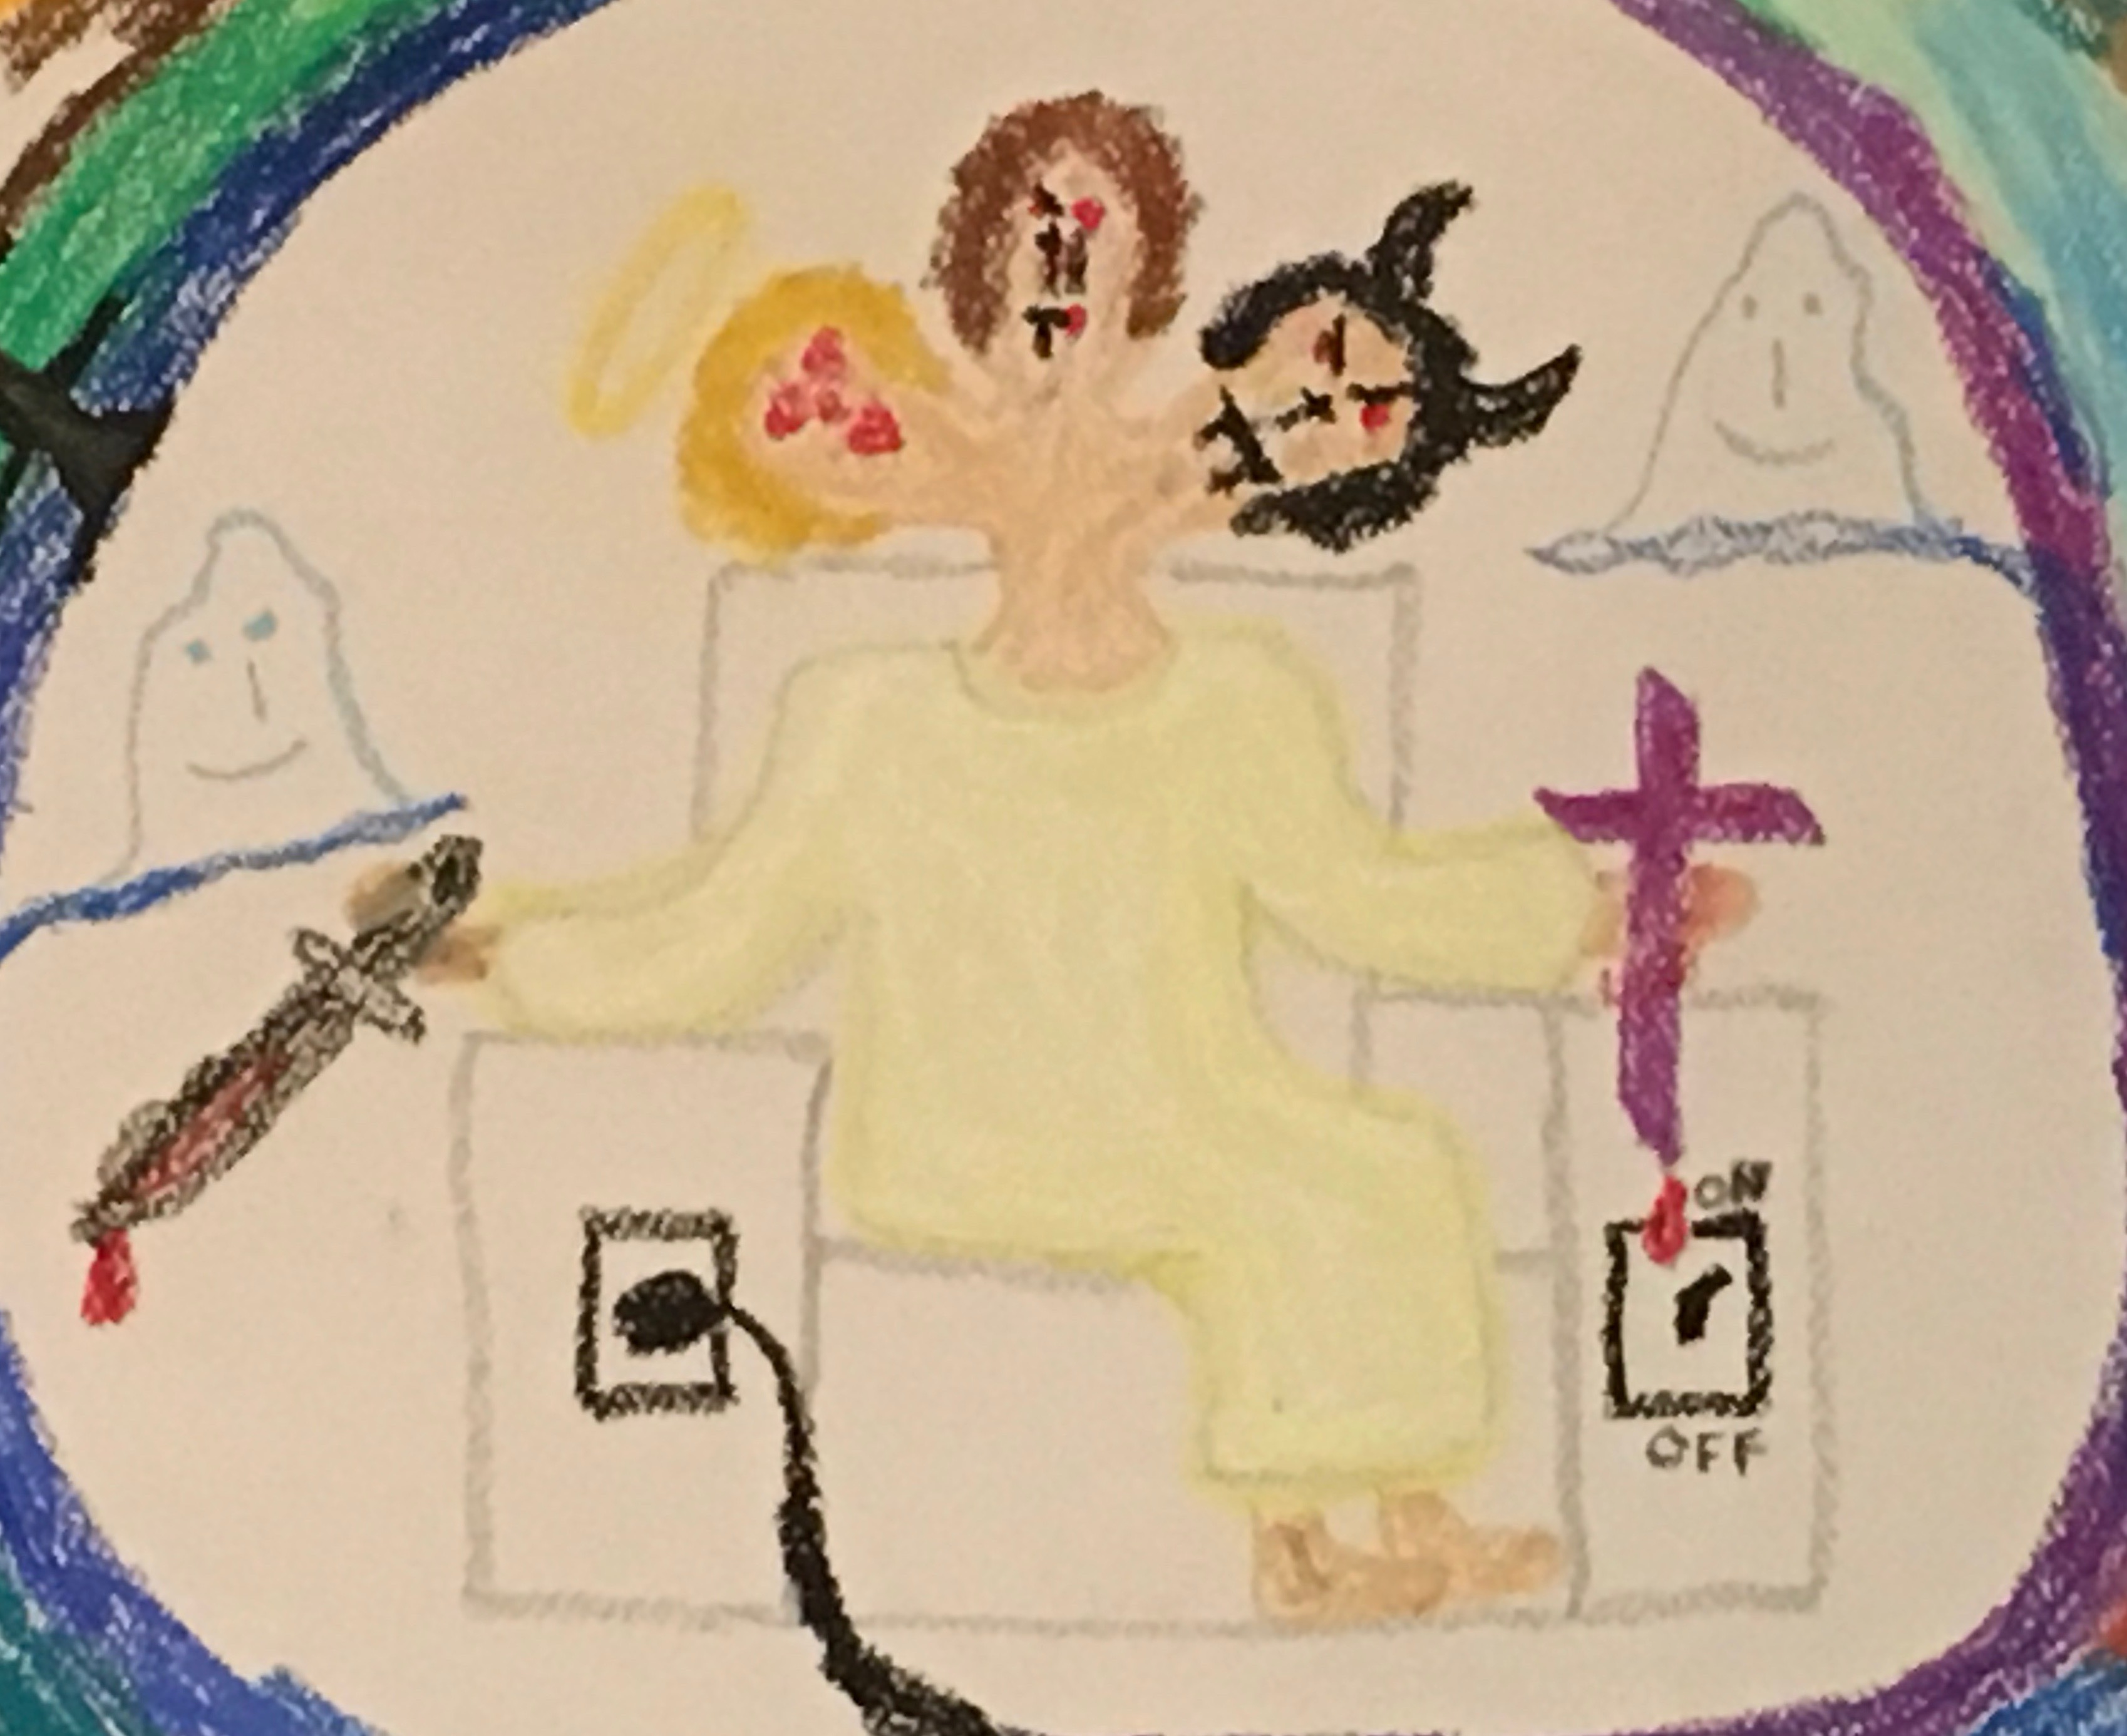 Jesus-Harry-Satan Face of Confusion